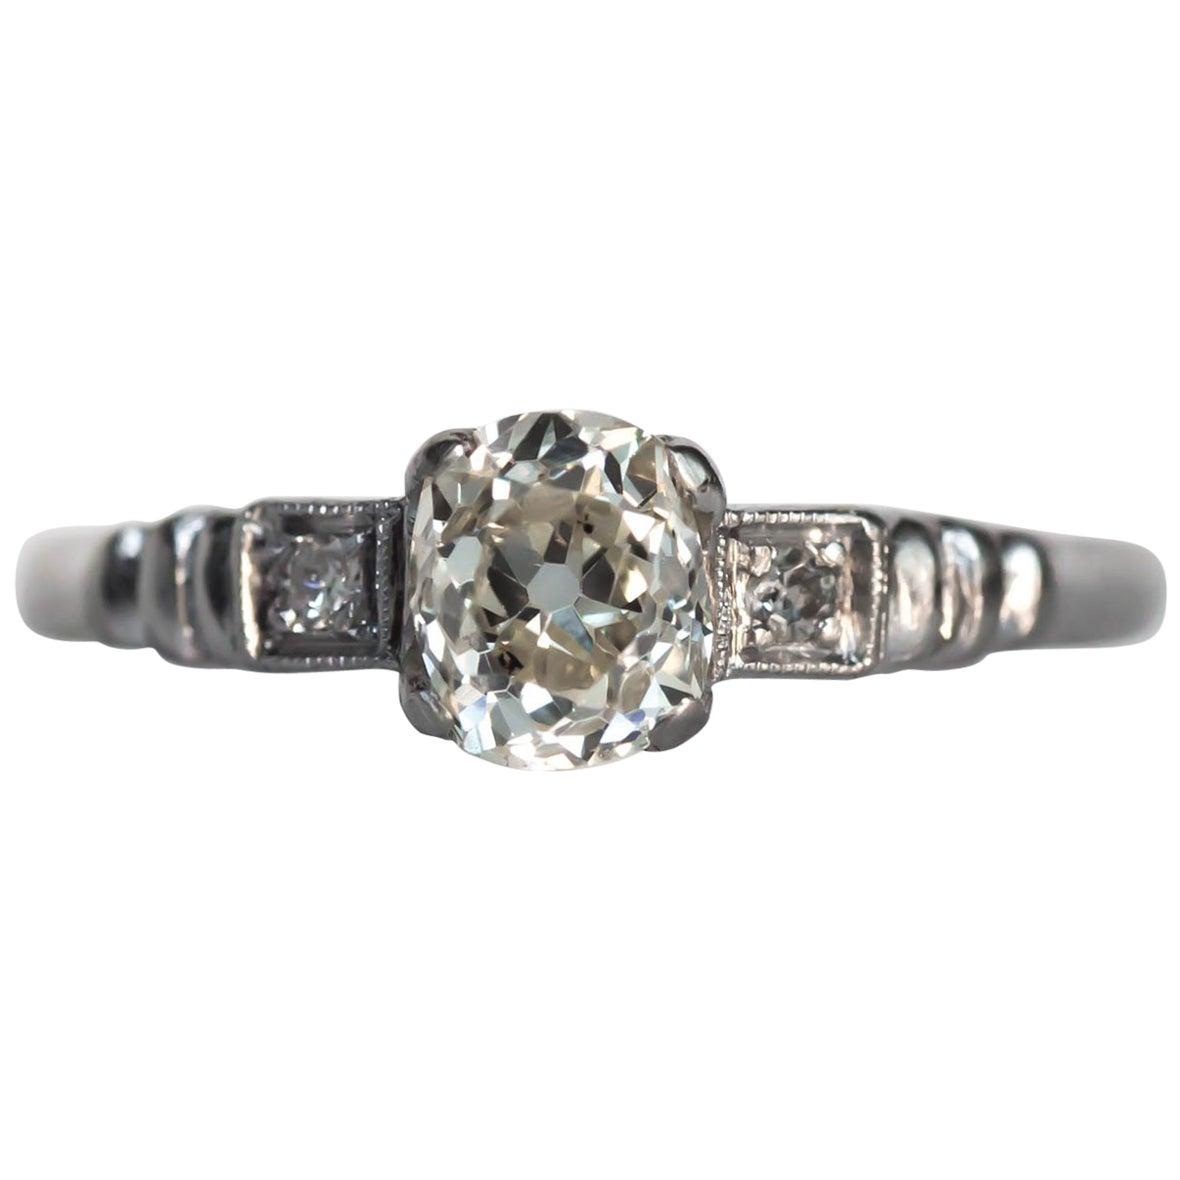 1920s Art Deco Platinum GIA Certified .71 Carat Diamond Engagement Ring